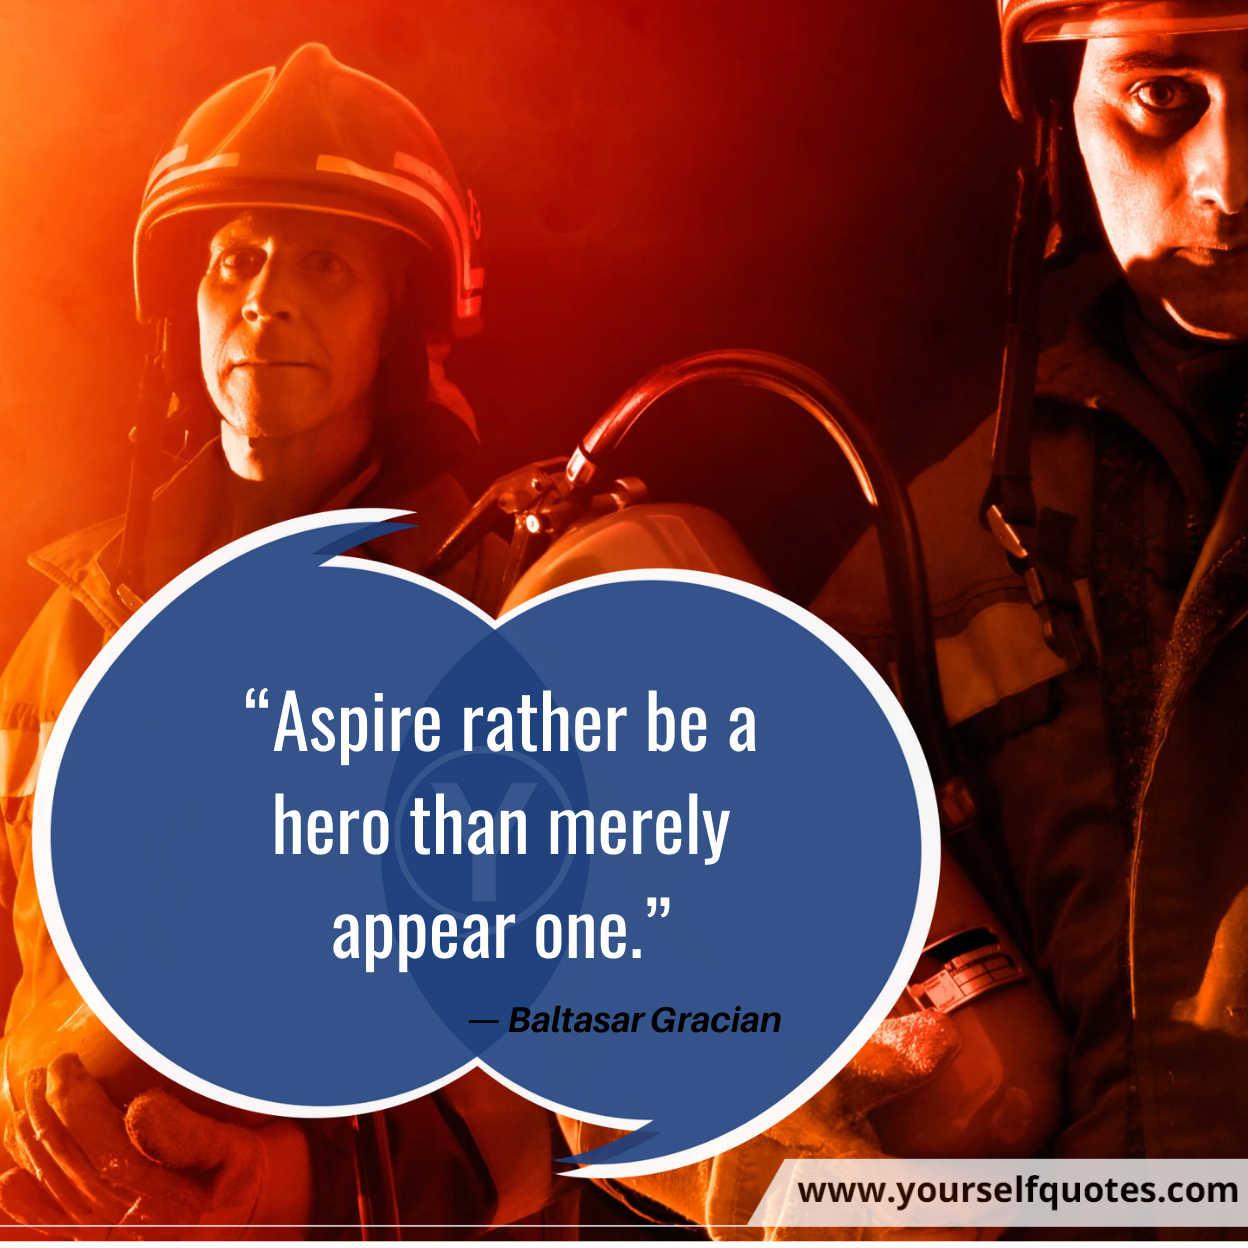 Gambar Kutipan Hari Pemadam Kebakaran